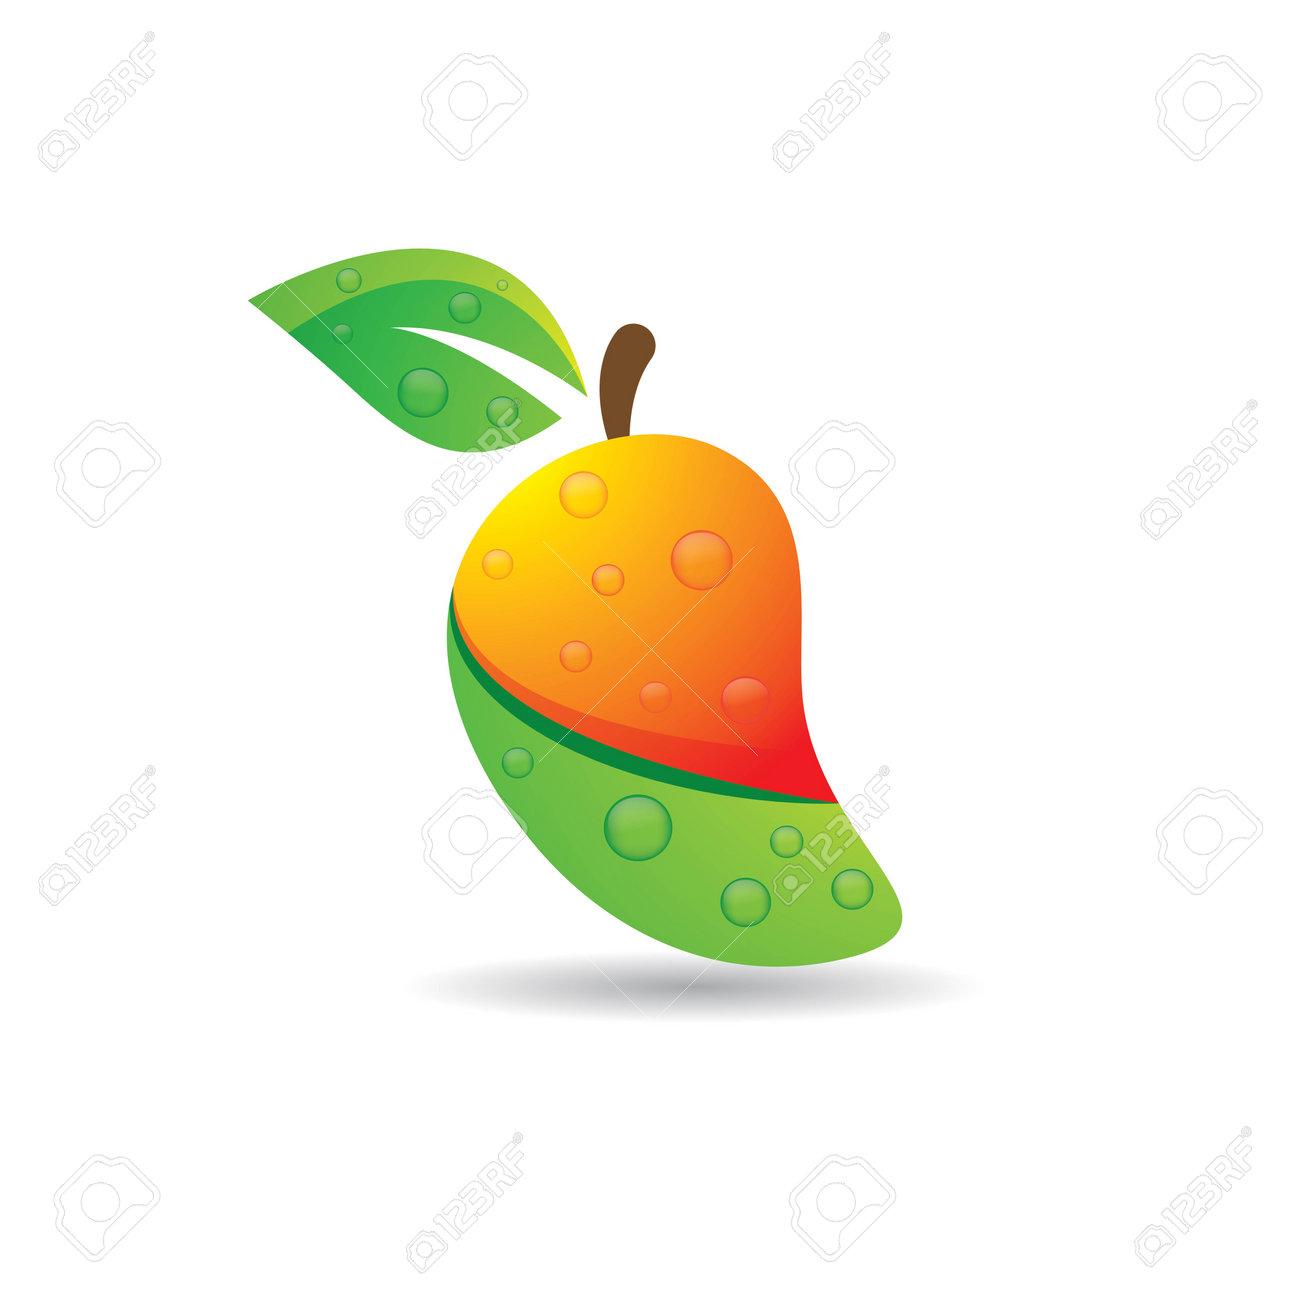 Mango images illustration design - 169265868